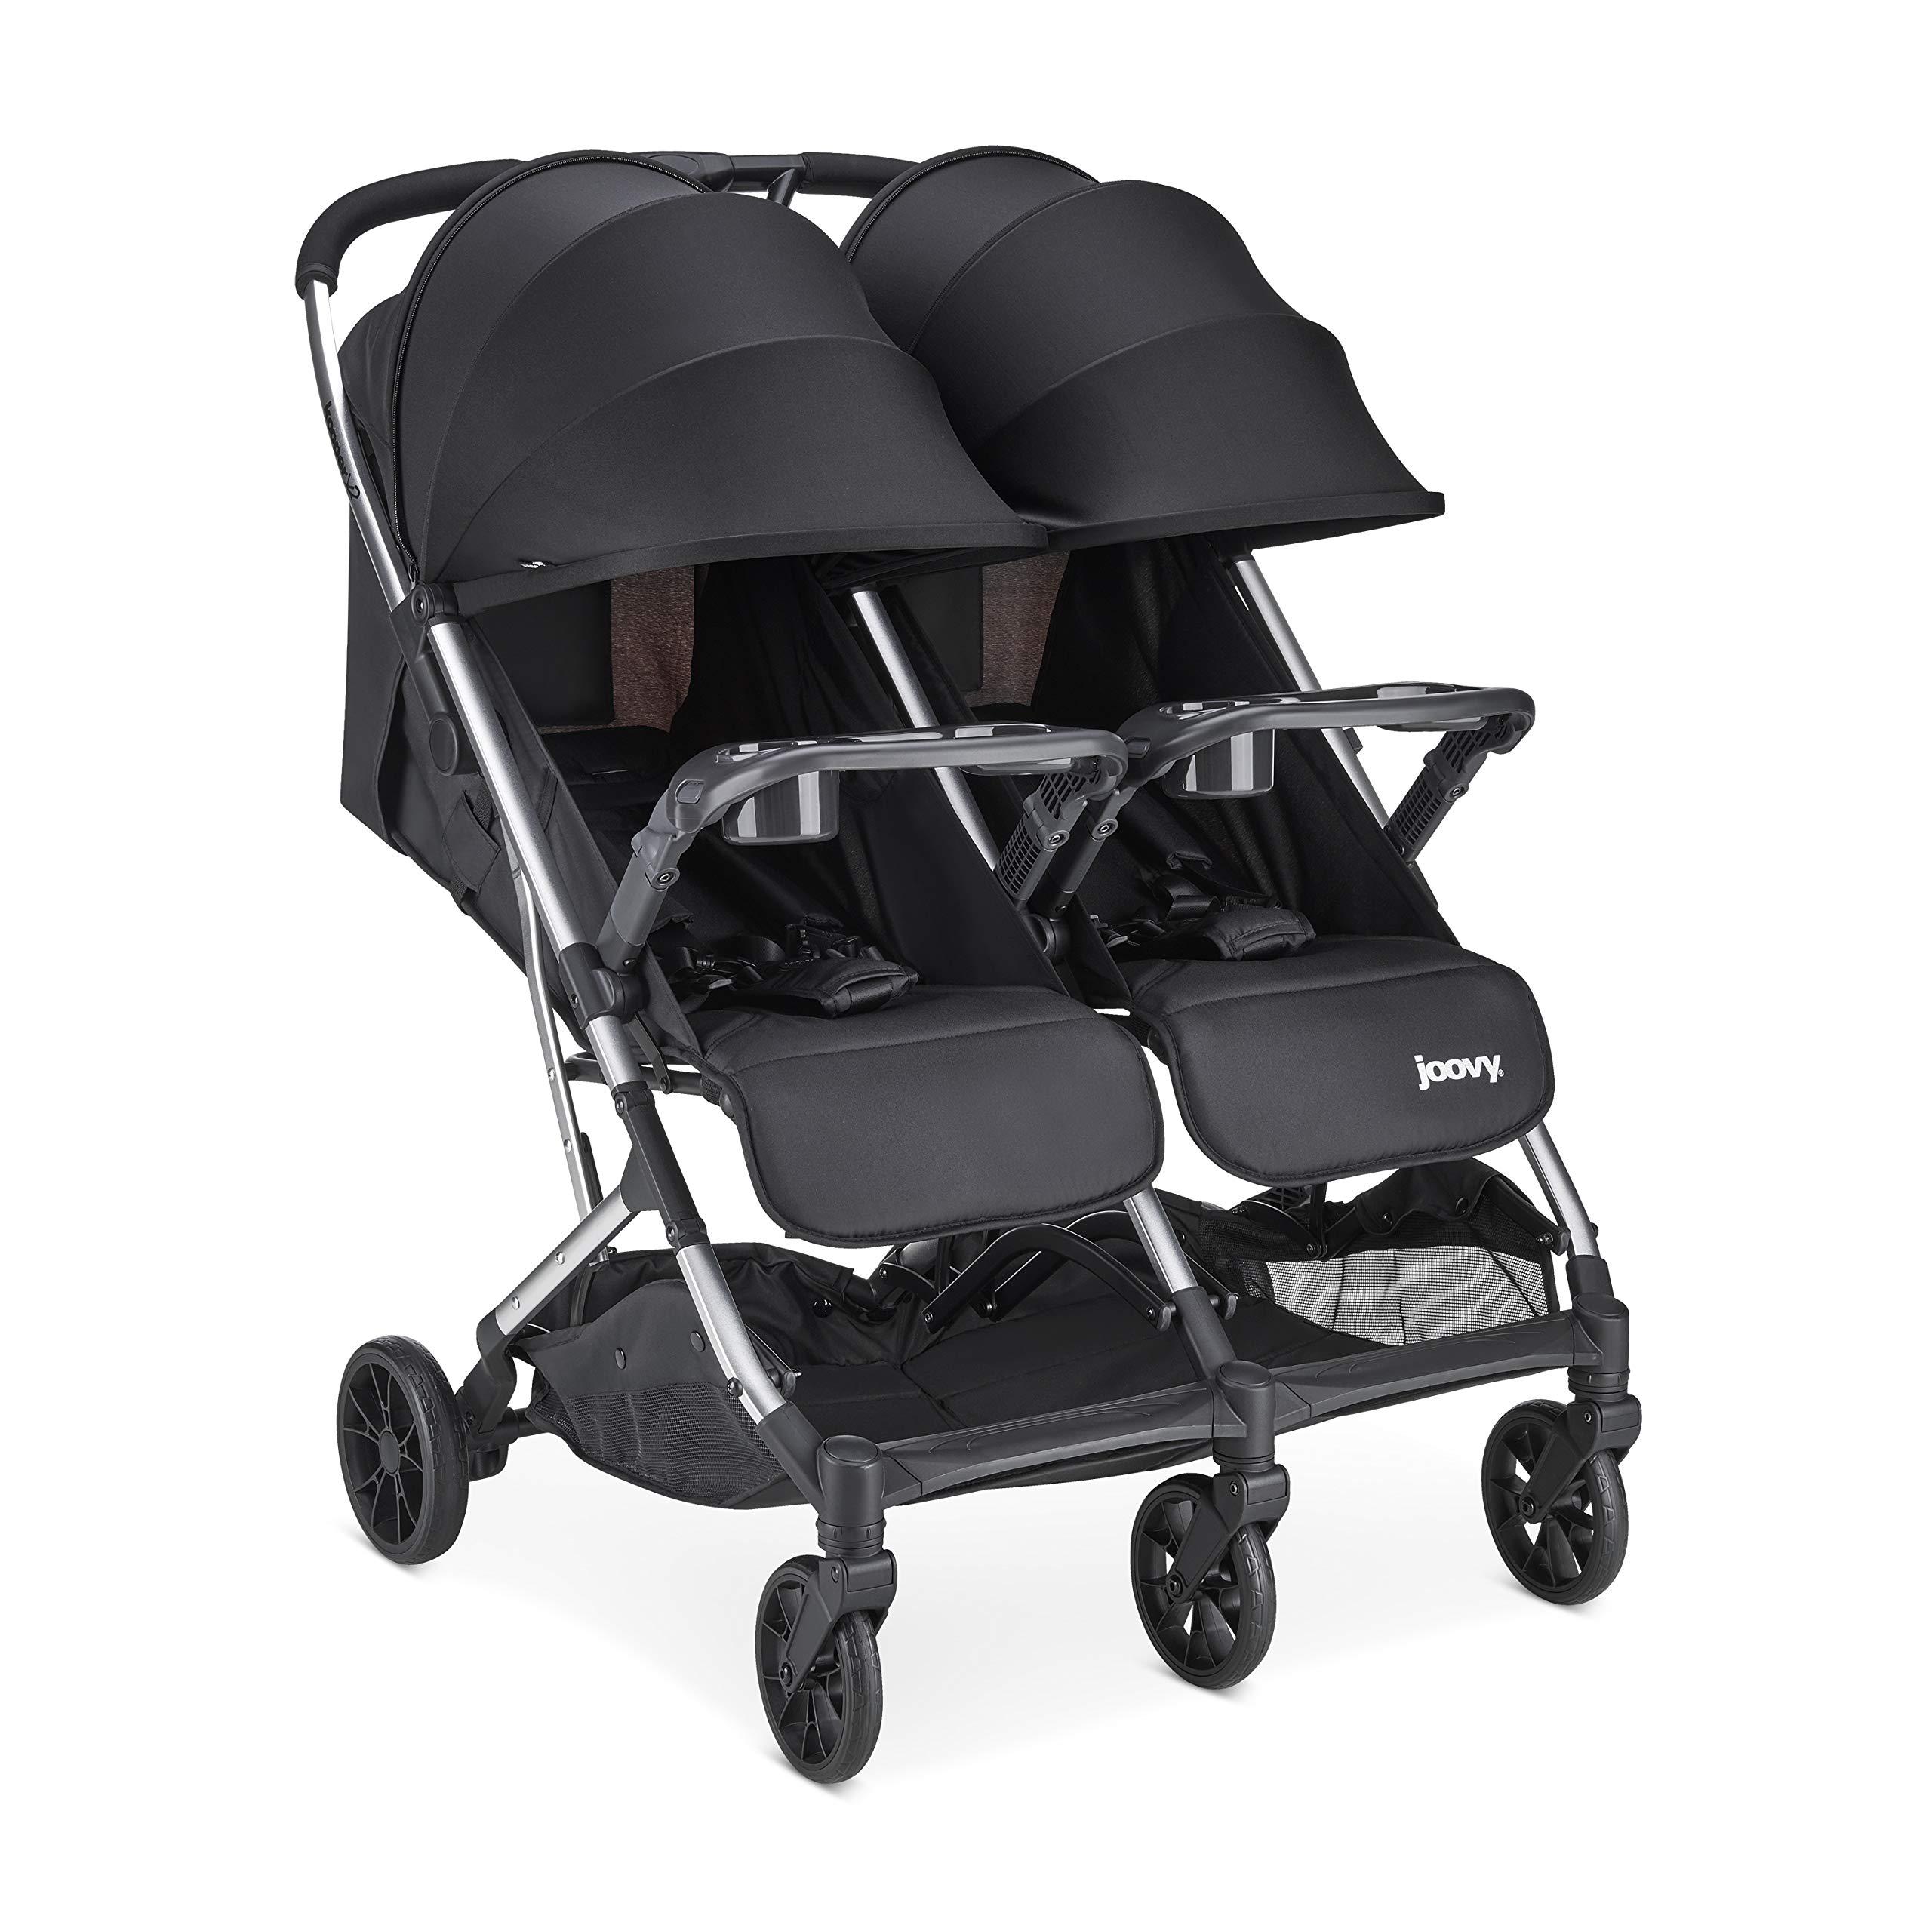 Joovy 8227 Kooper X2 Stroller, Black